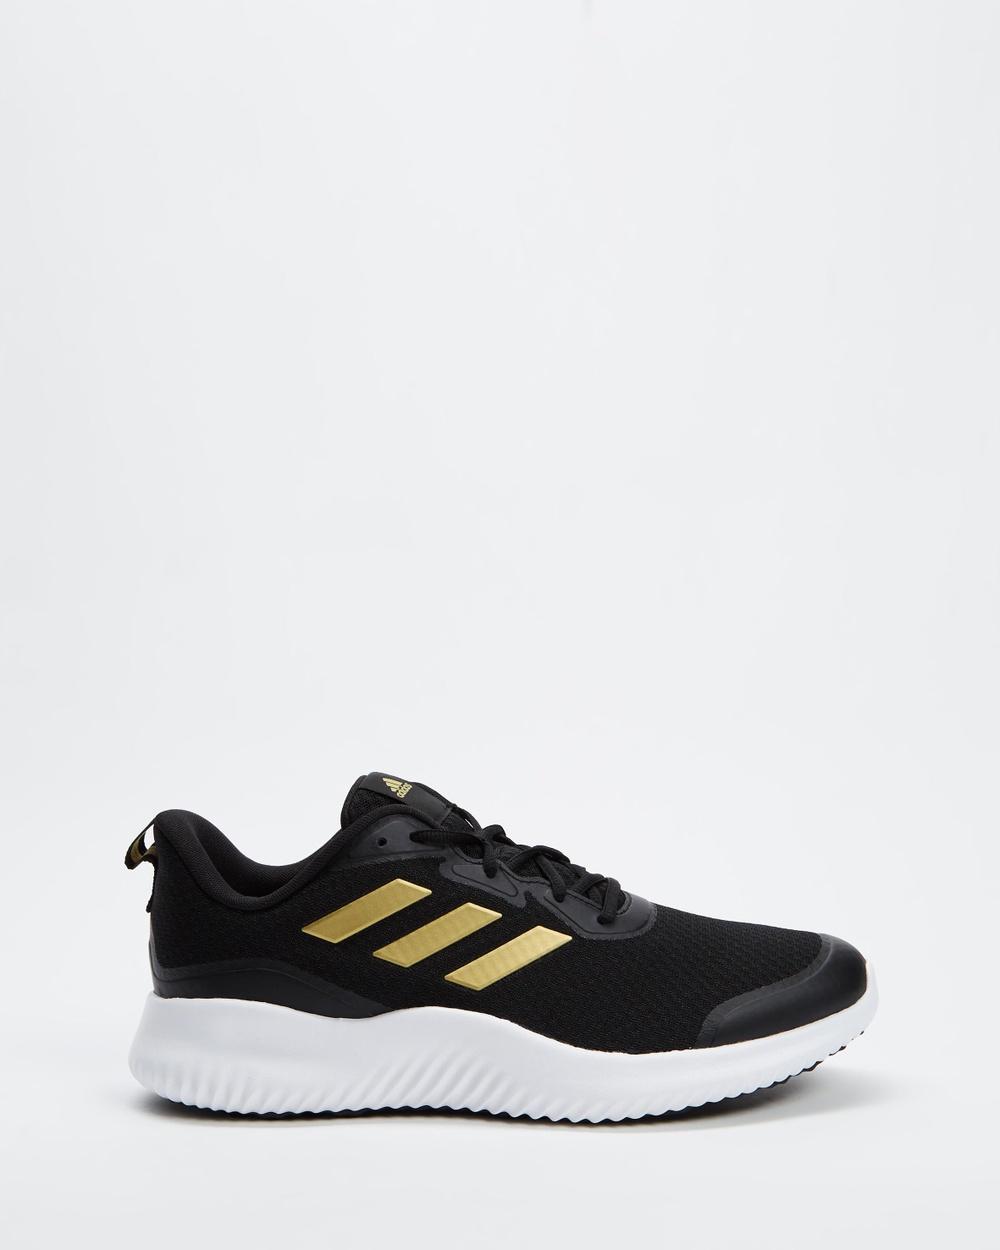 adidas Performance Alphabounce TD Men's Shoes Core Black, Metallic Gold & Cloud White